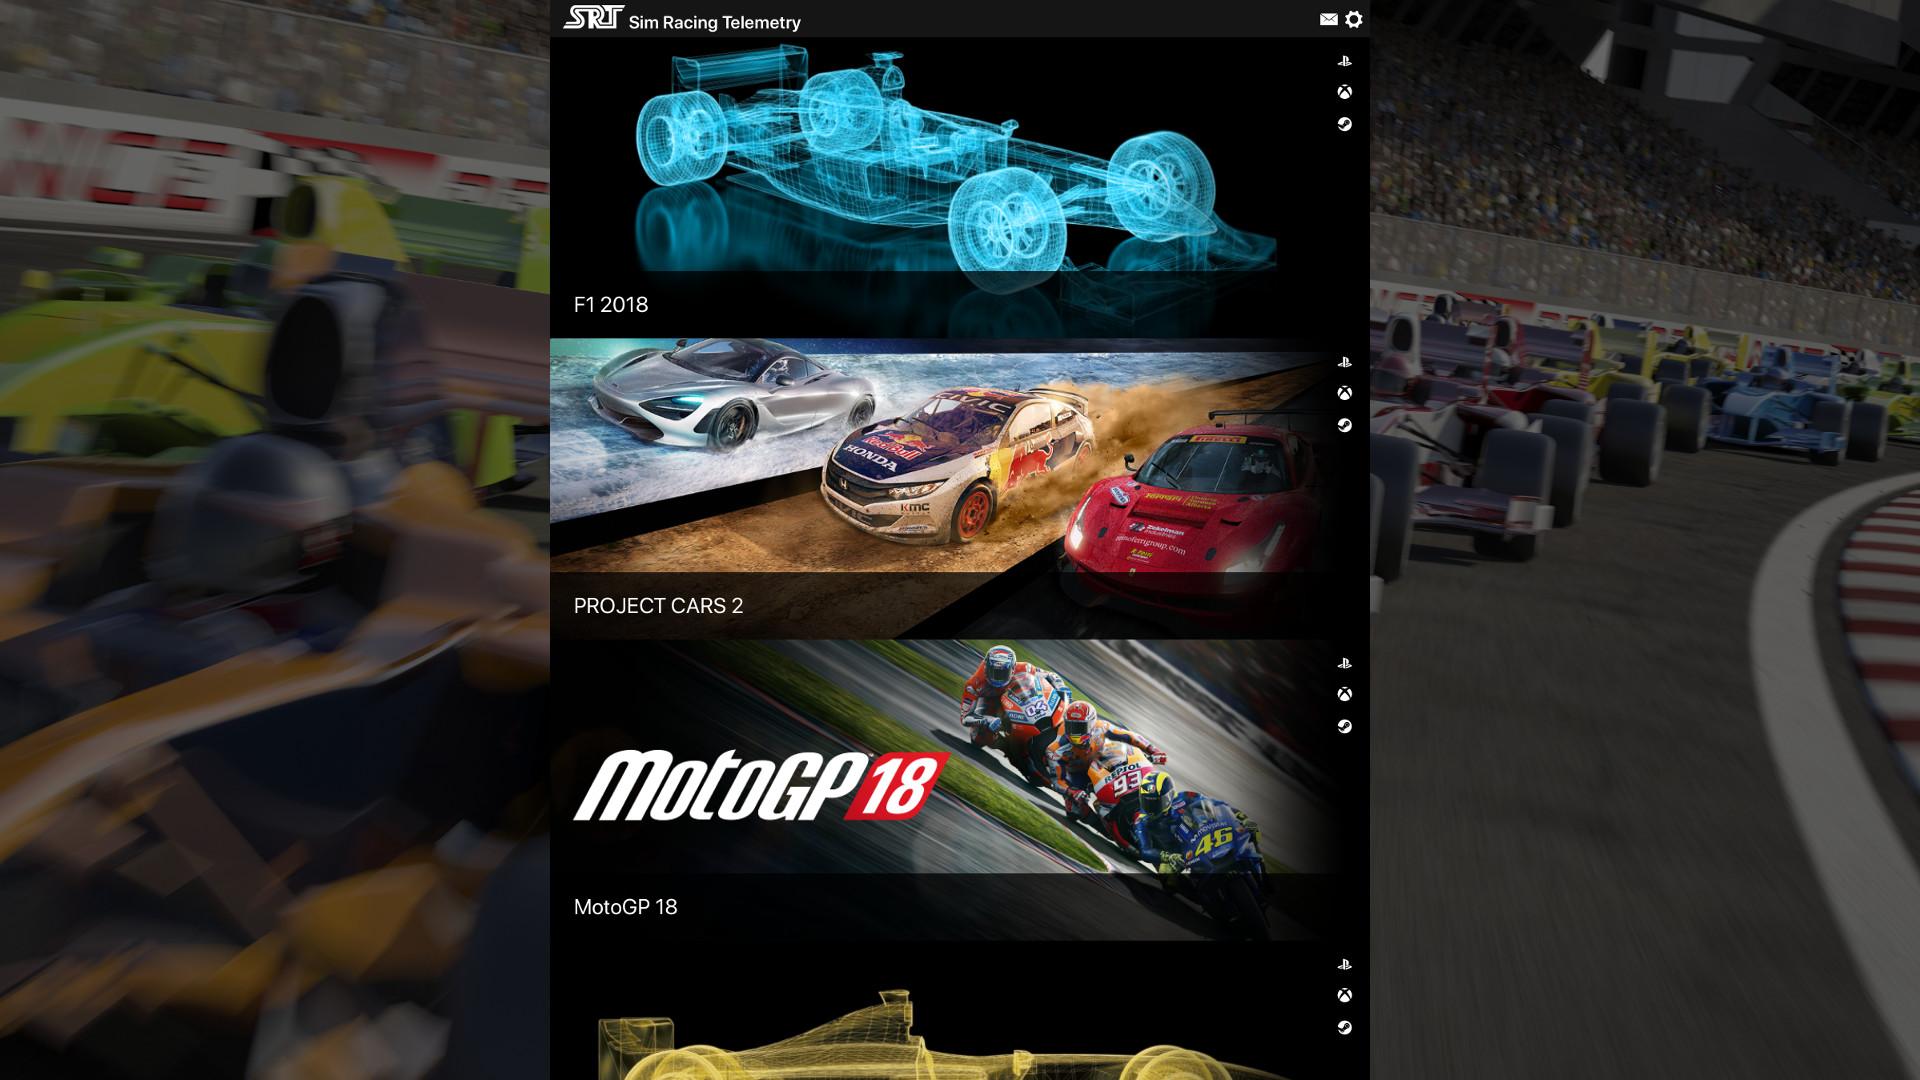 Sim Racing Telemetry - Project Cars 2